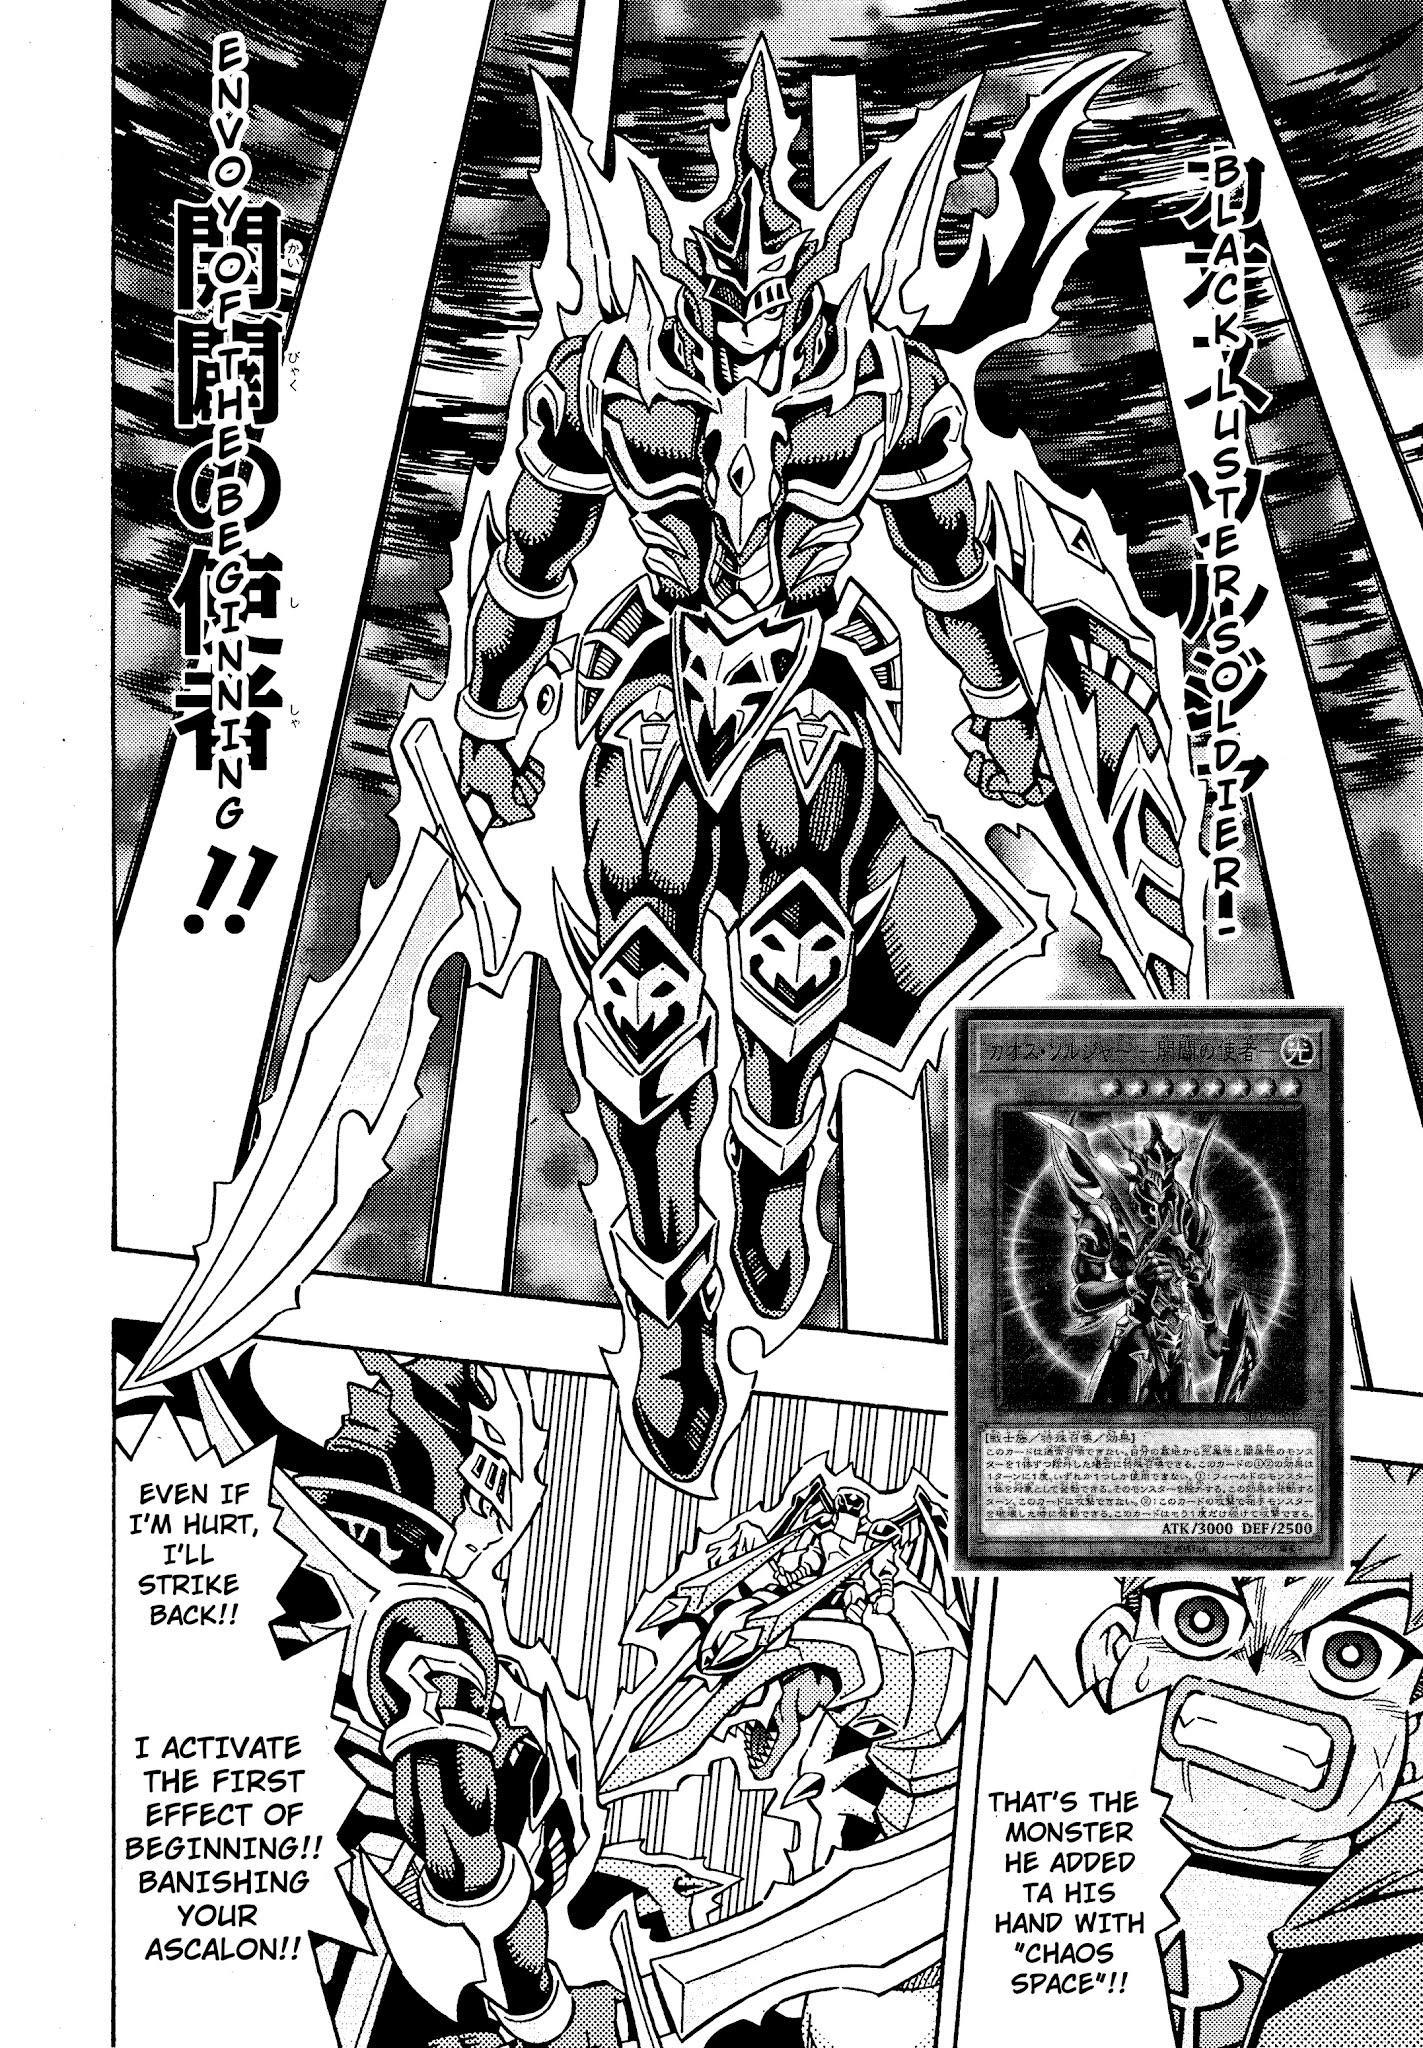 Yu-Gi-Oh! Ocg Structures Chapter 18: Dragunity Vs Chaos page 8 - Mangakakalots.com